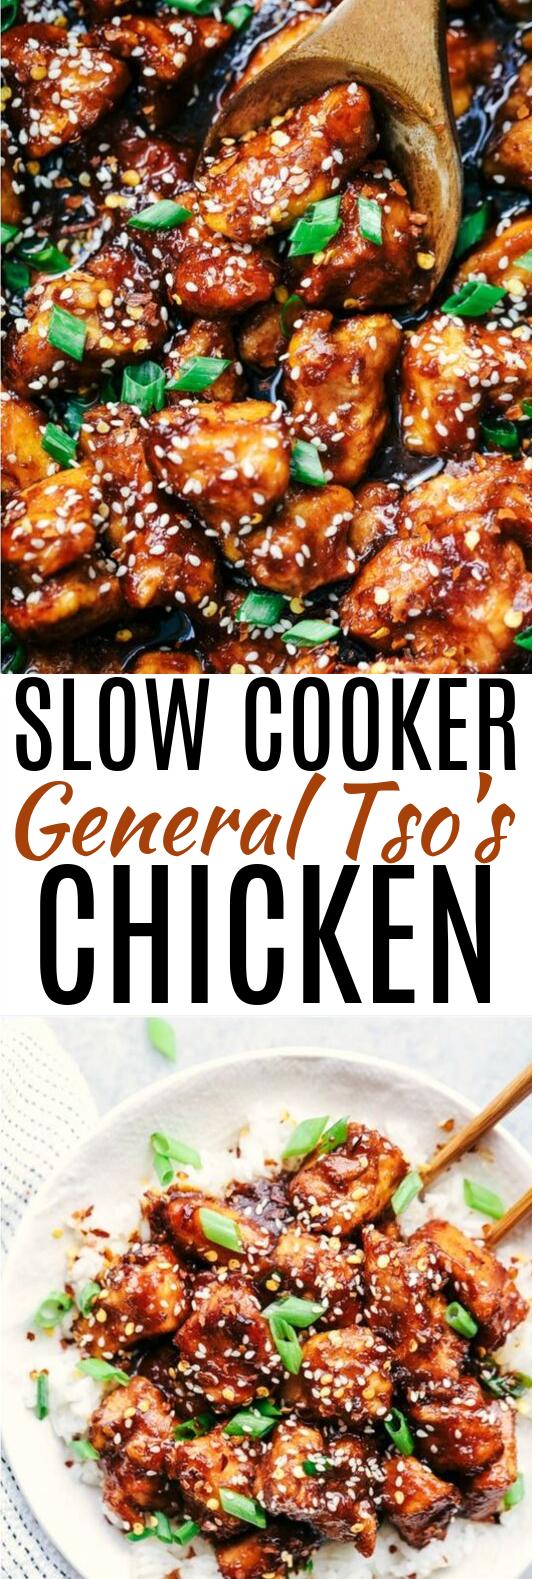 Slow Cooker General Tso's Chicken #dinner #chicken